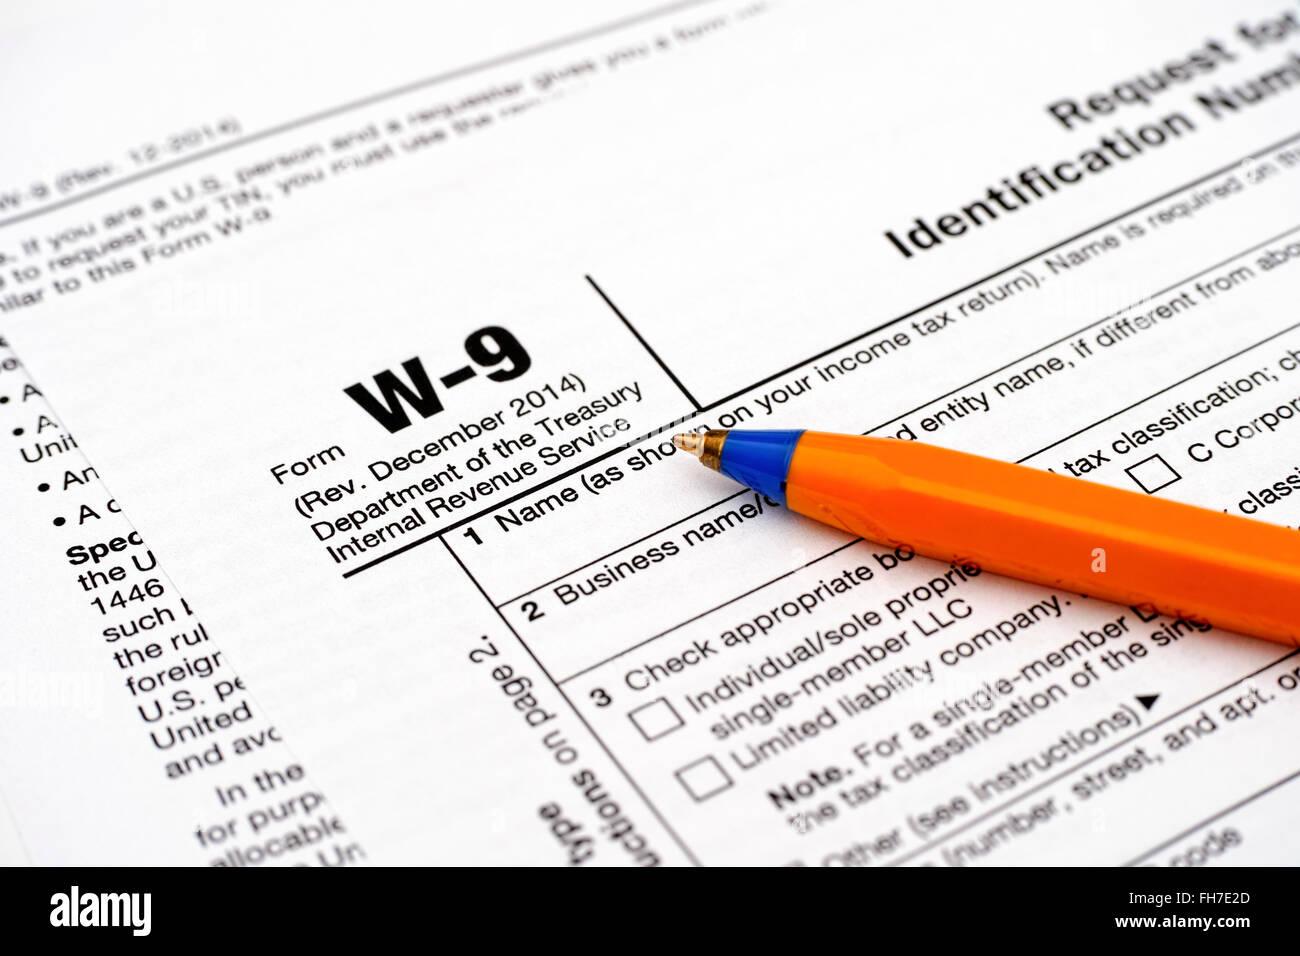 Request Form Stockfotos & Request Form Bilder - Alamy